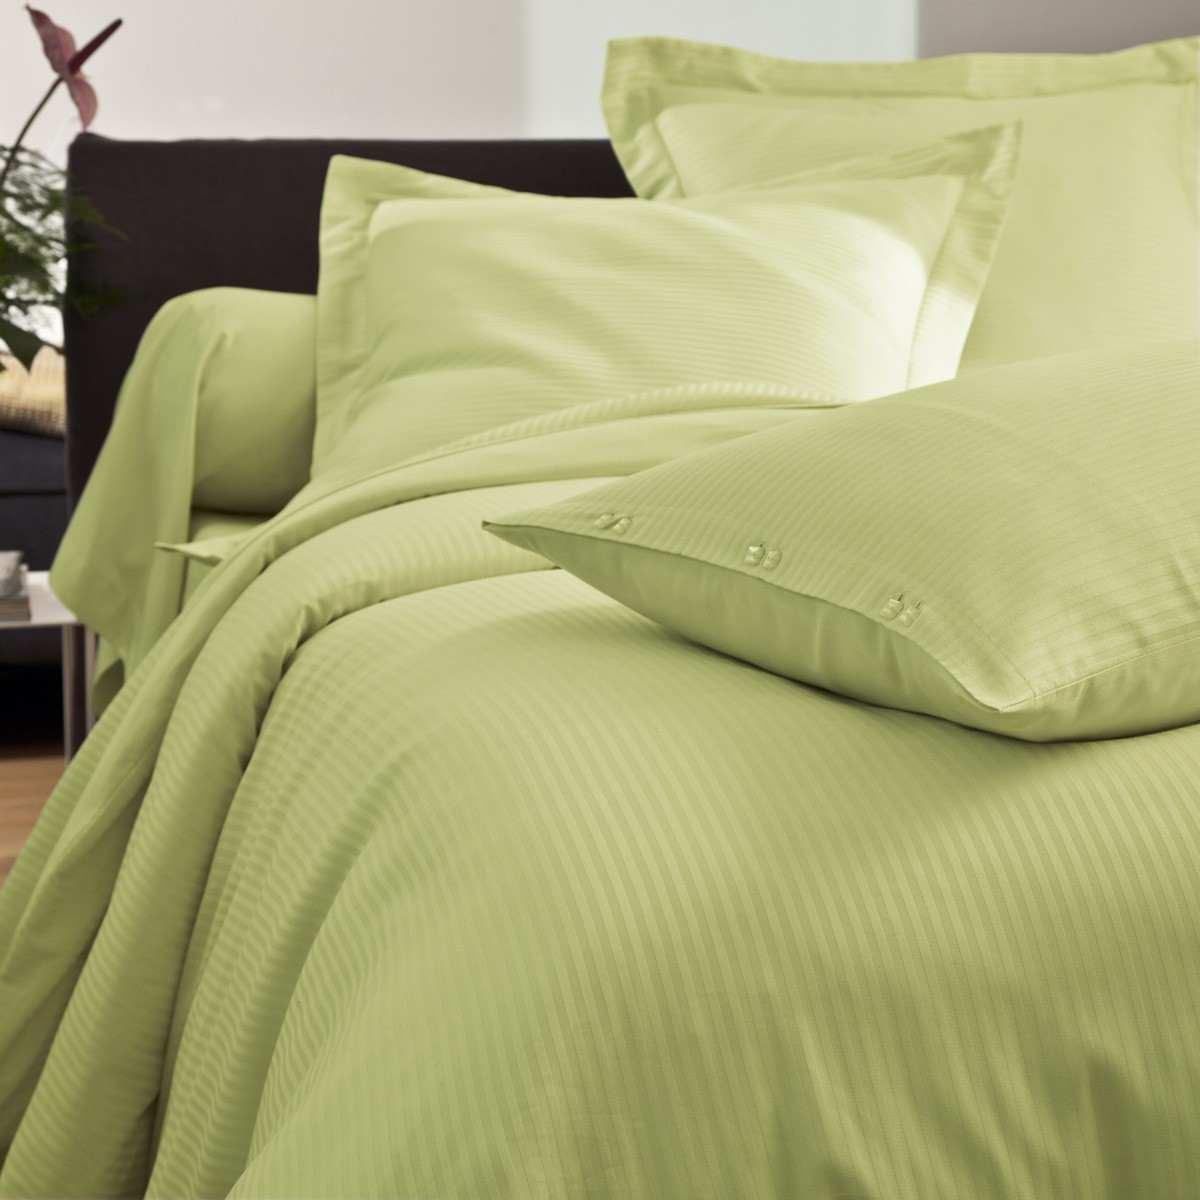 Duvet Cover Satin Jacquard white   Bed linen   Tradition des Vosges